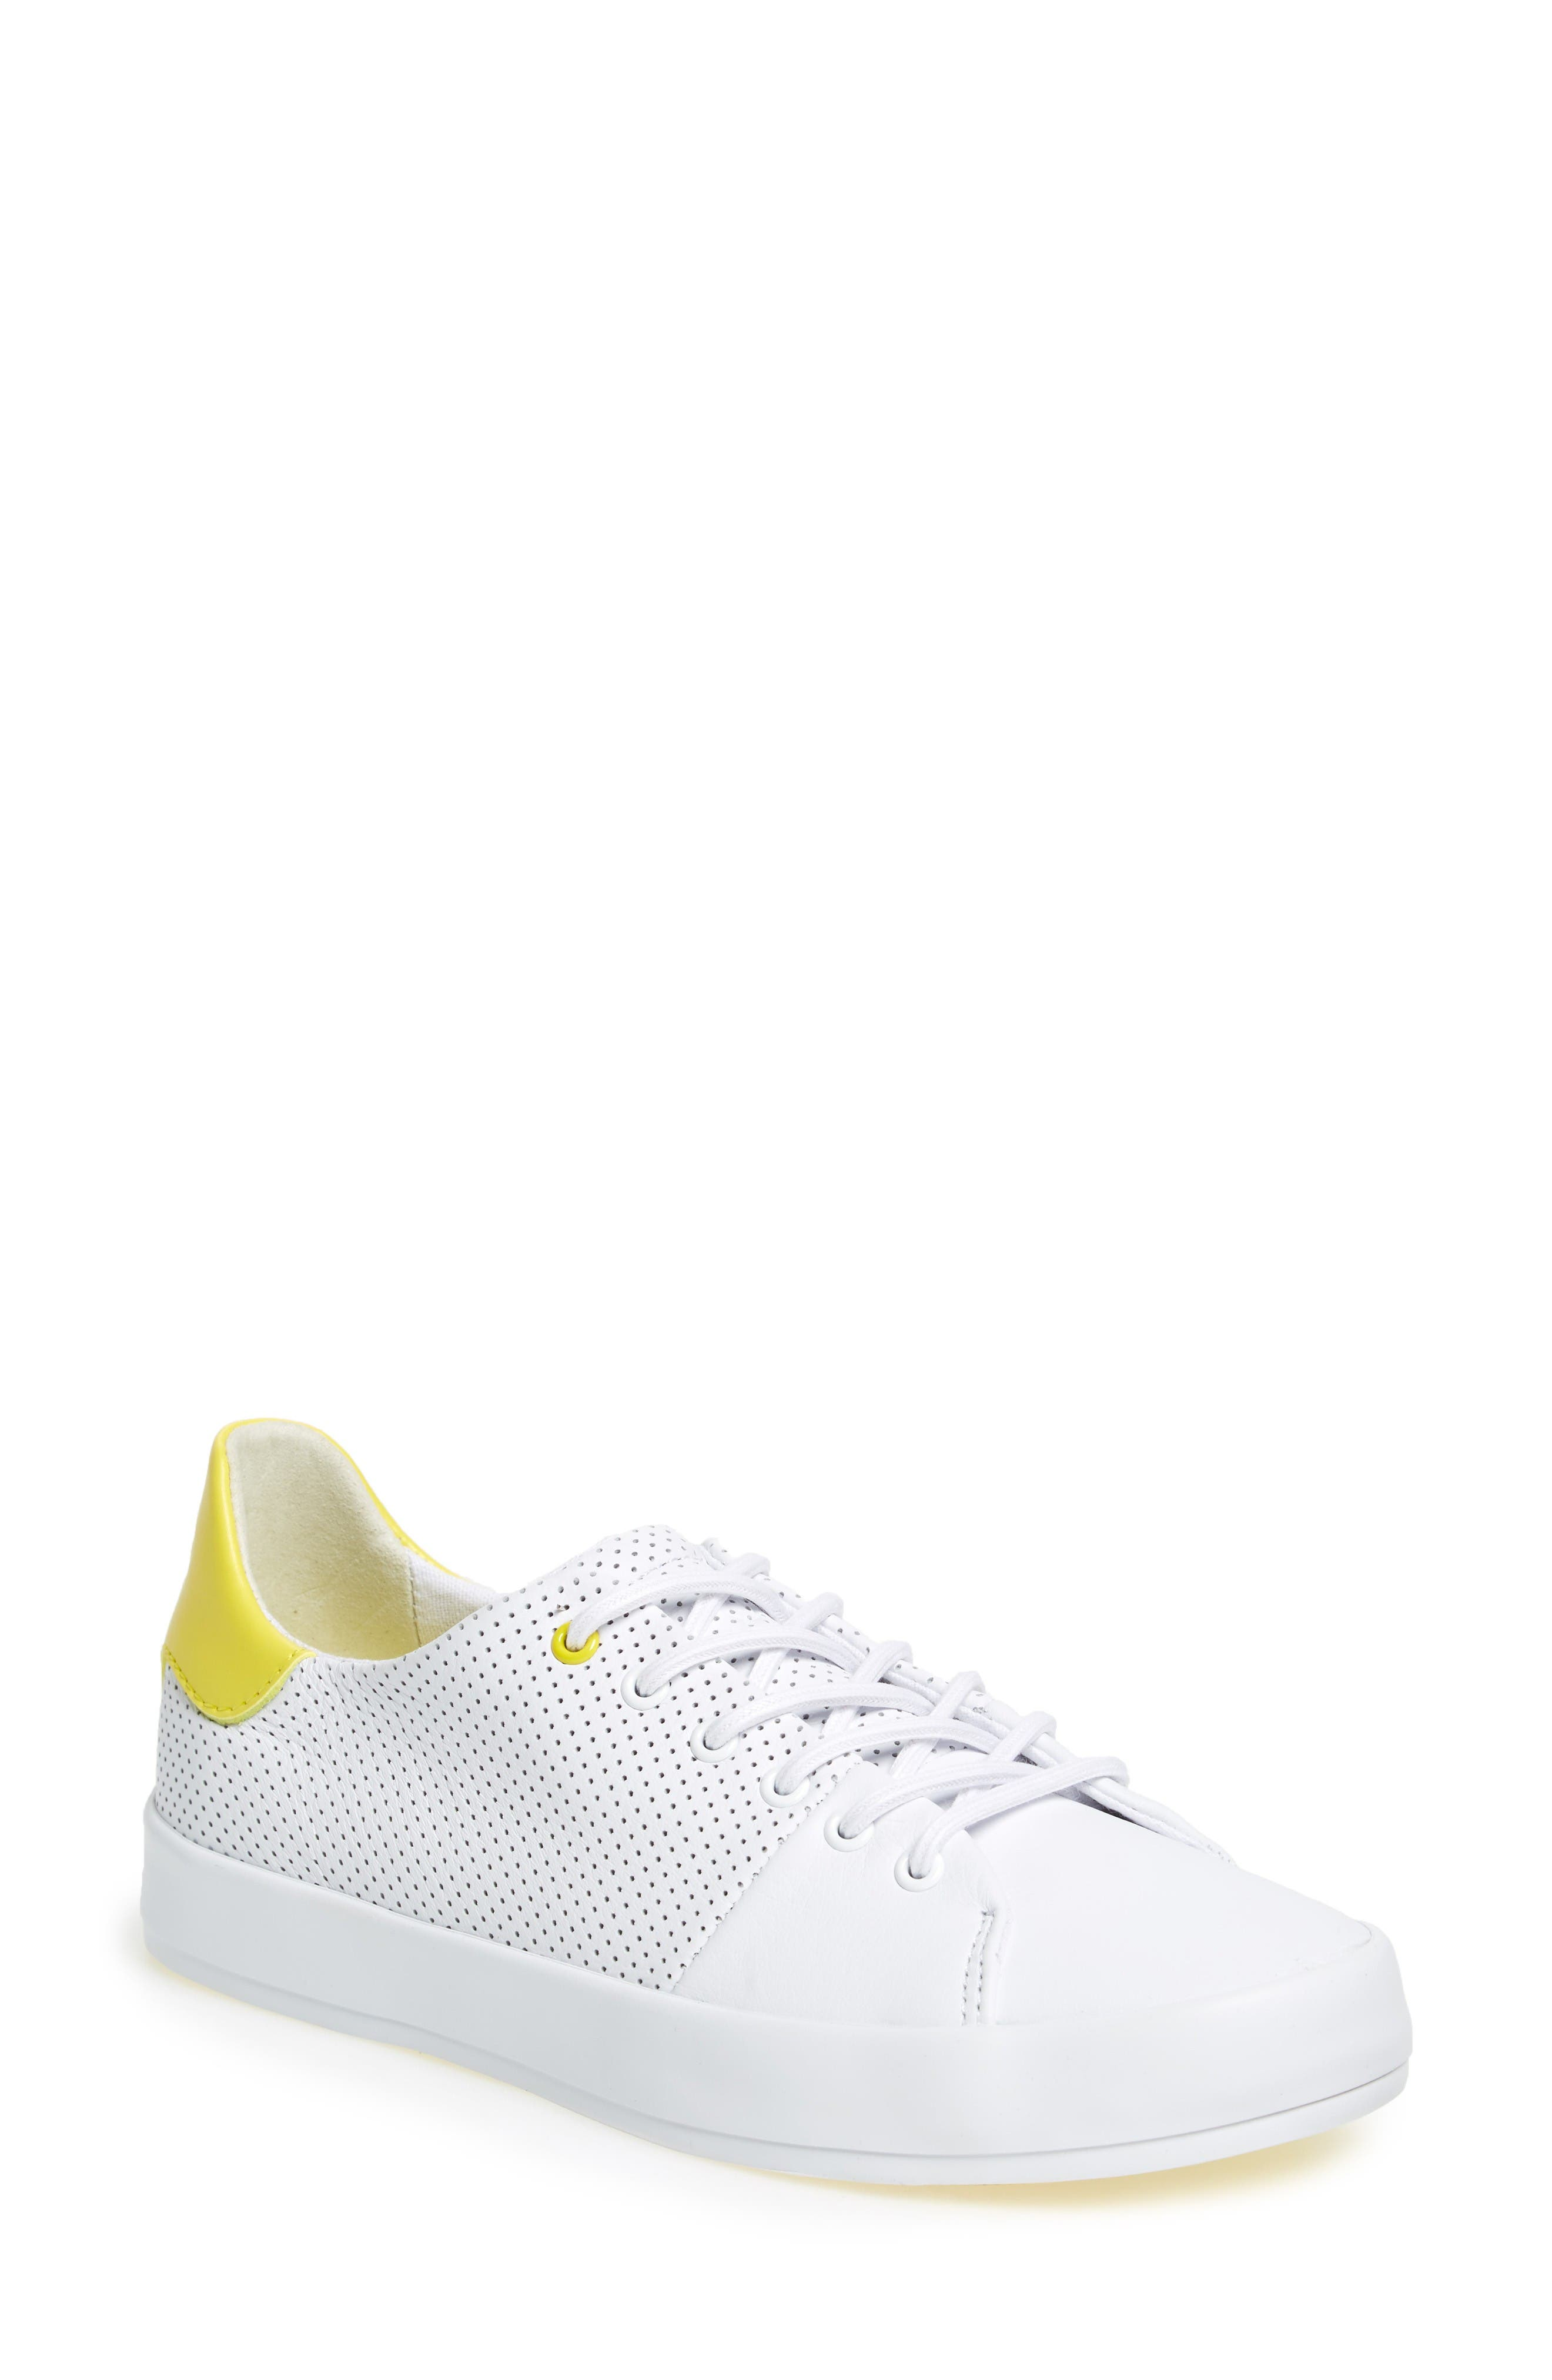 Main Image - Creative Recreation x Nick Jonas Carda Perforated Sneaker (Women)